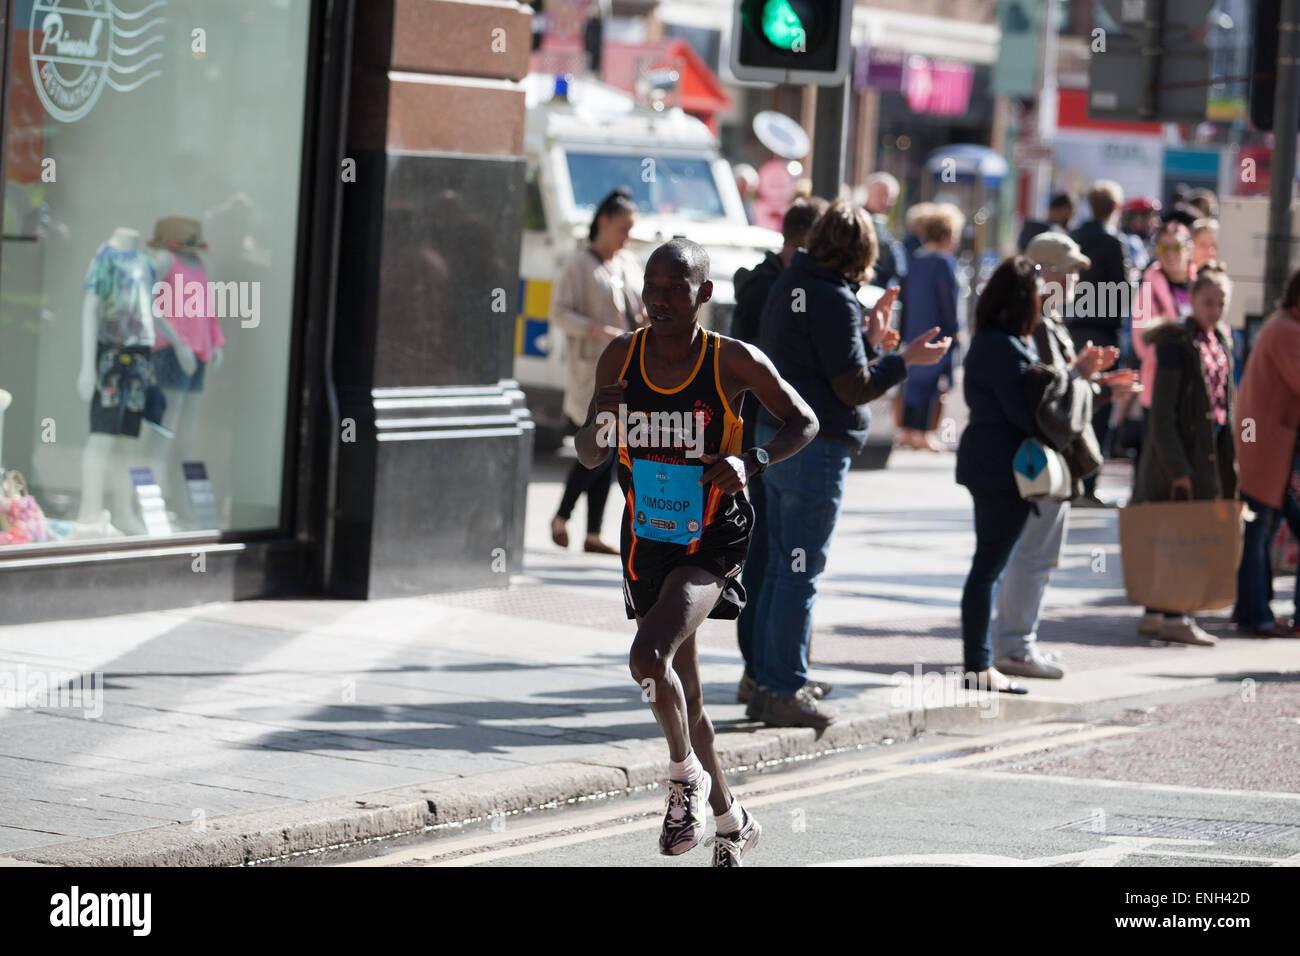 Belfast UK. 4th May 2015. Gideon Kimosop who came second in the 2015 Belfast City Marathon - Stock Image